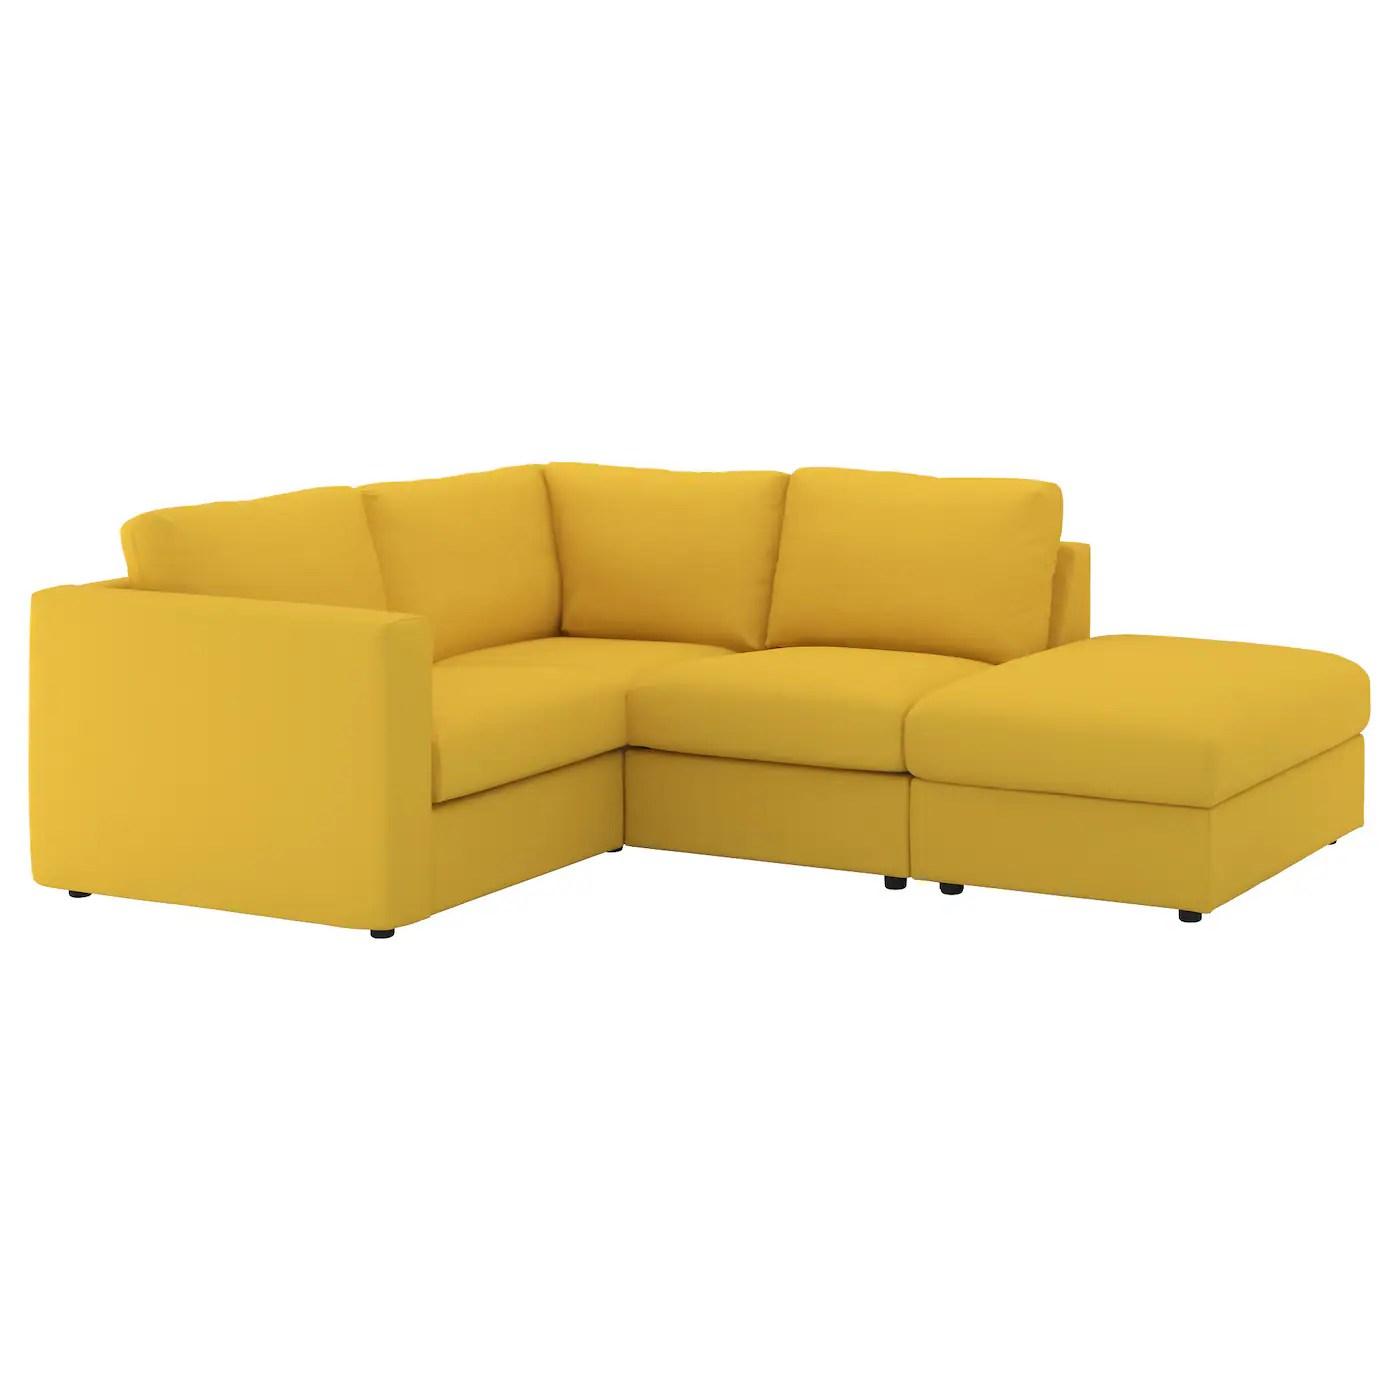 ikea rp corner sofa covers uk ready made australia 3 seater sectional seat lofallet beige